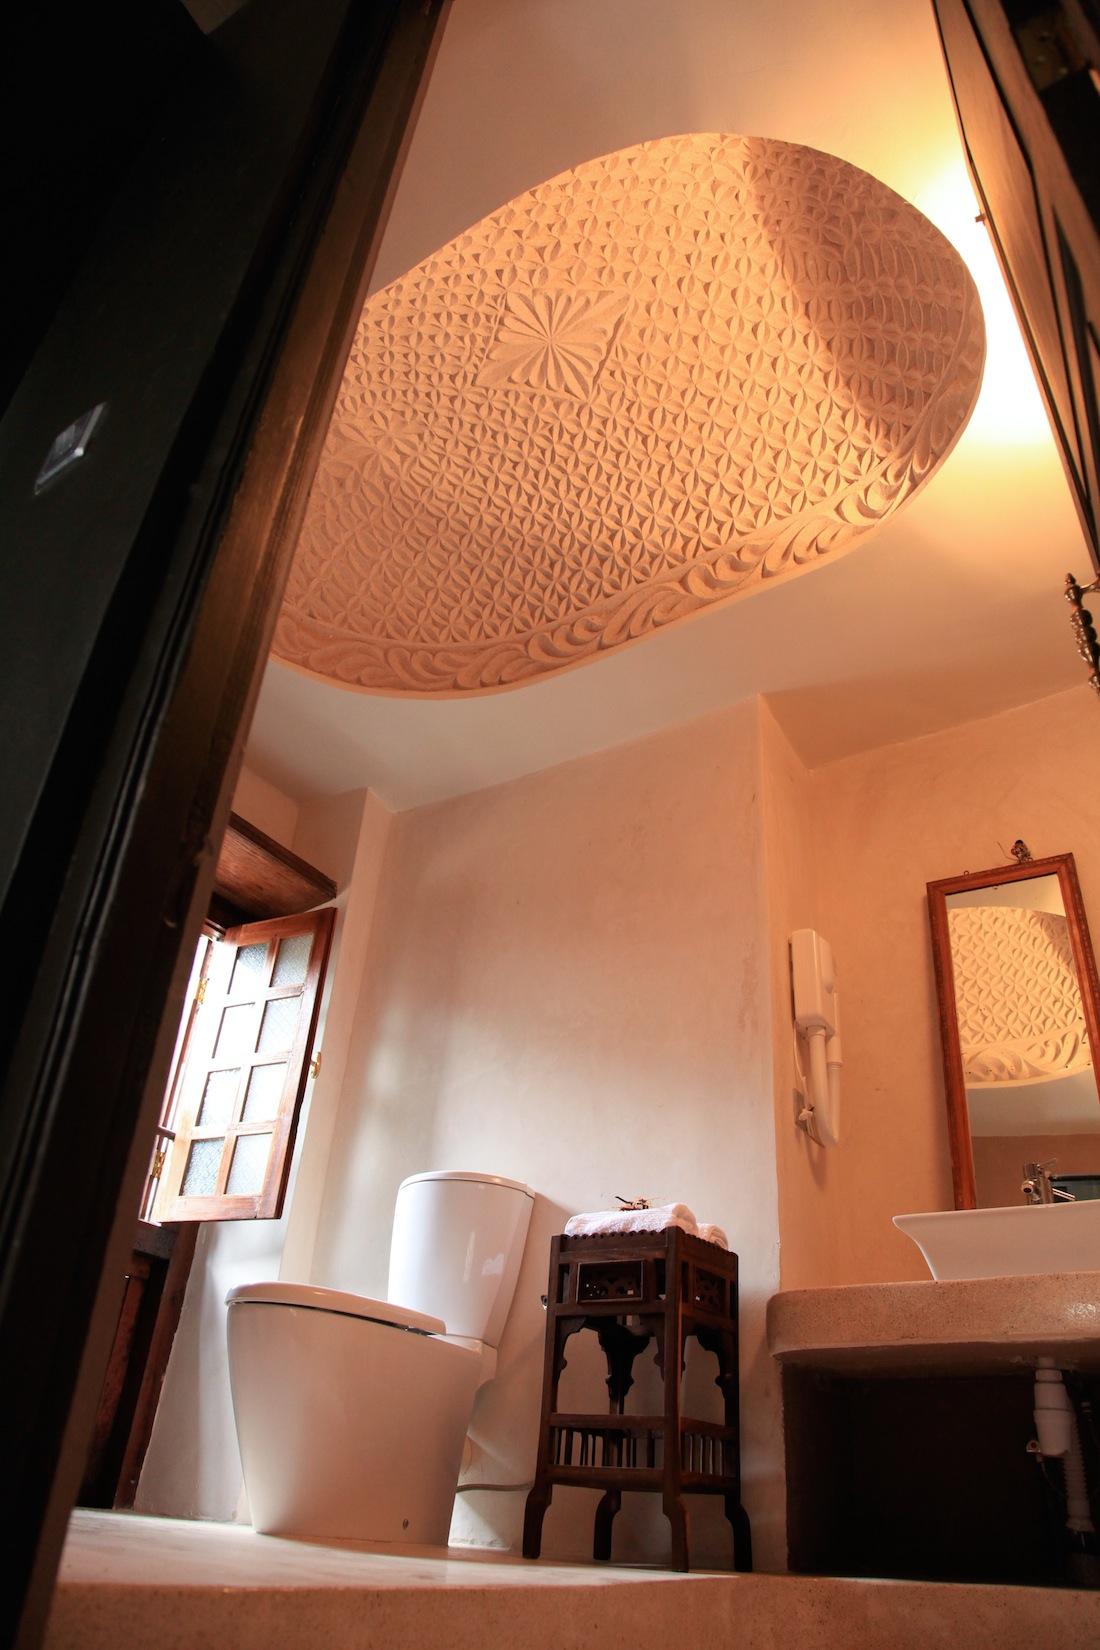 Mashariki-palace-hotel-zanzibar-stone-town-chambres-rooms-05